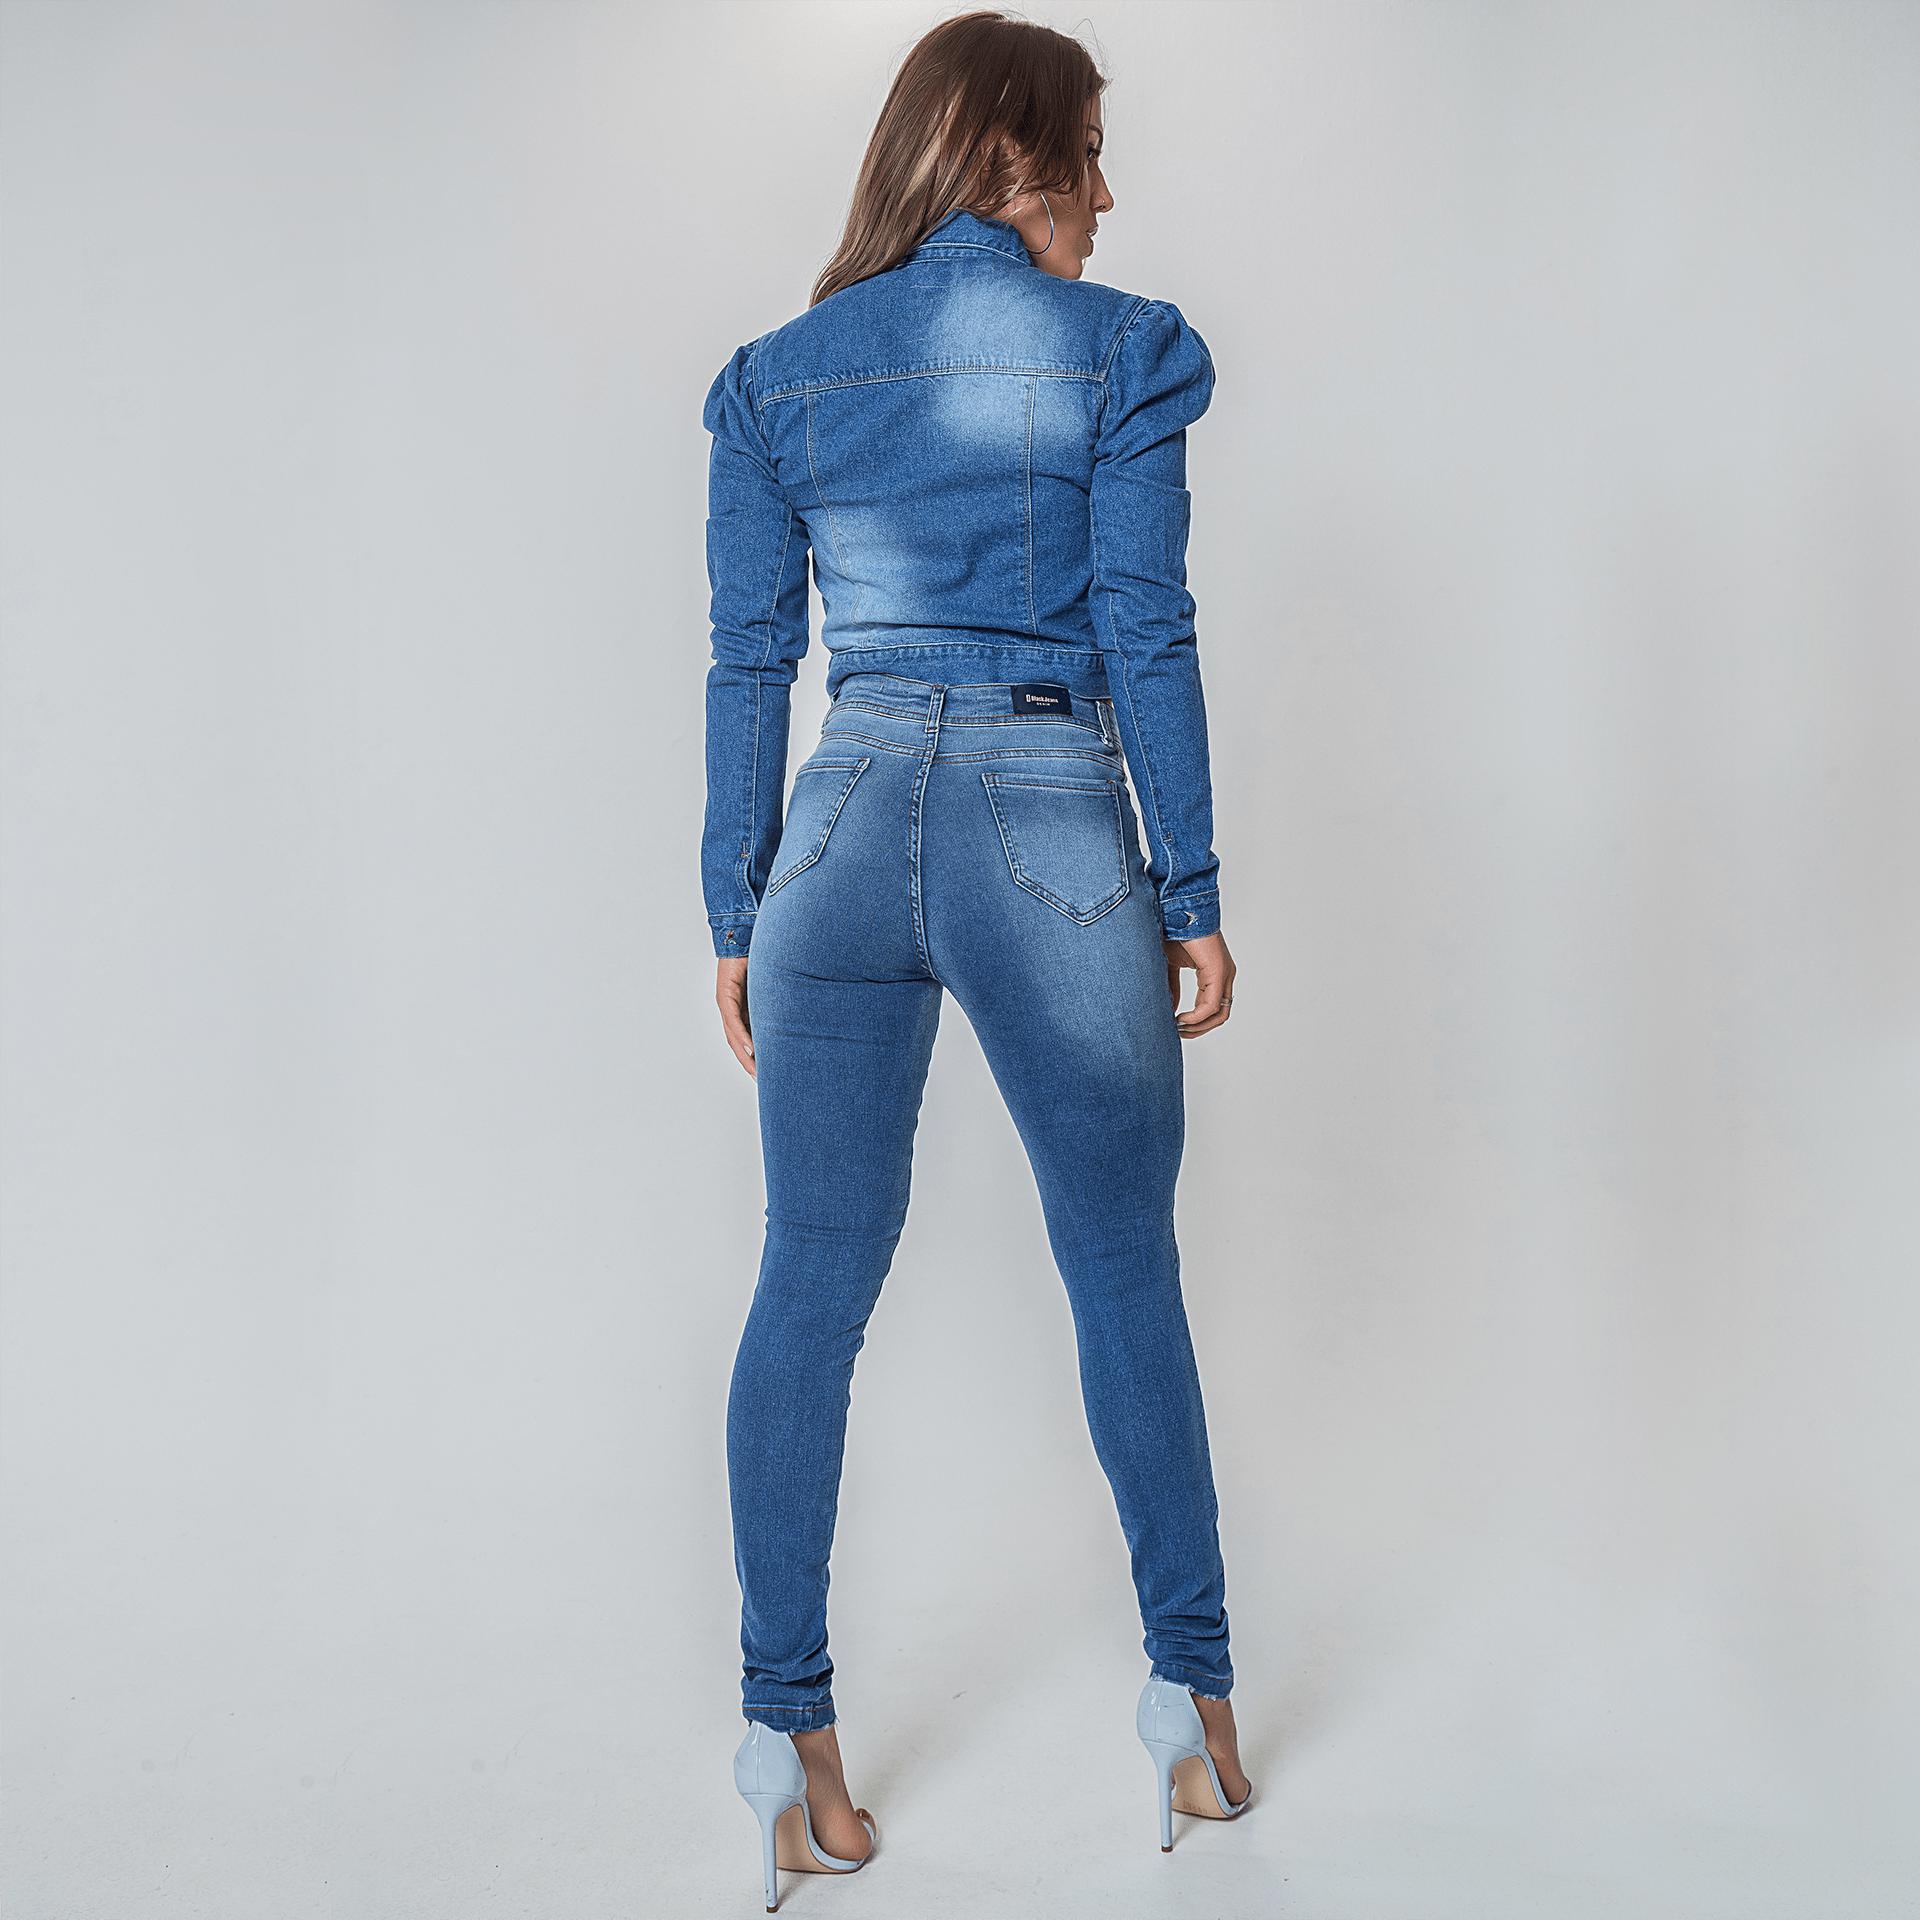 Camisa e Jaqueta Jeans